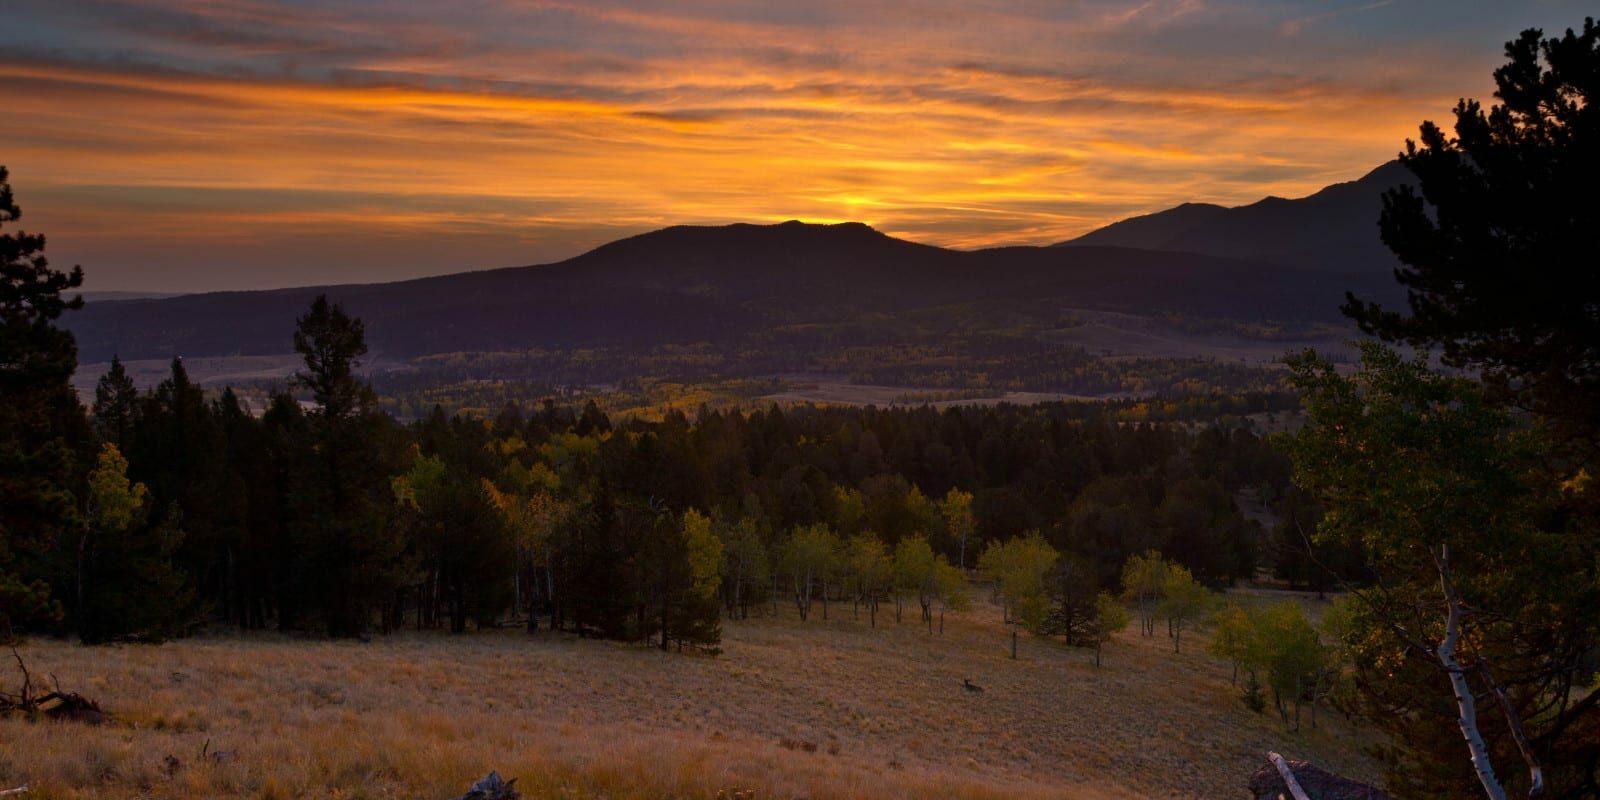 Mueller State Park View of Pikes Peak Sunrise